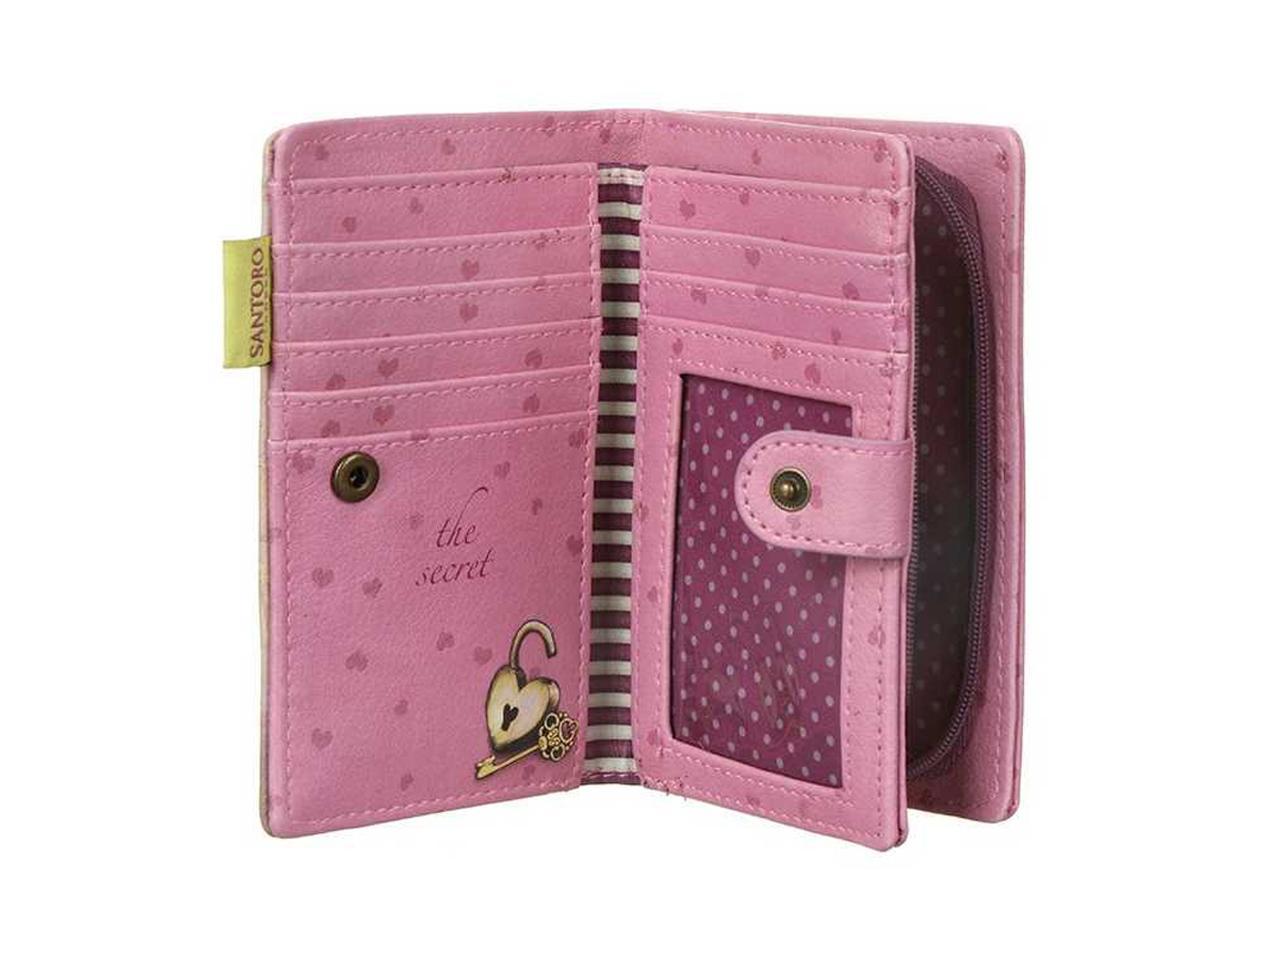 Santoro Gorjuss Small Purse Wallet Cosmetics Case Accessory Case The Secret